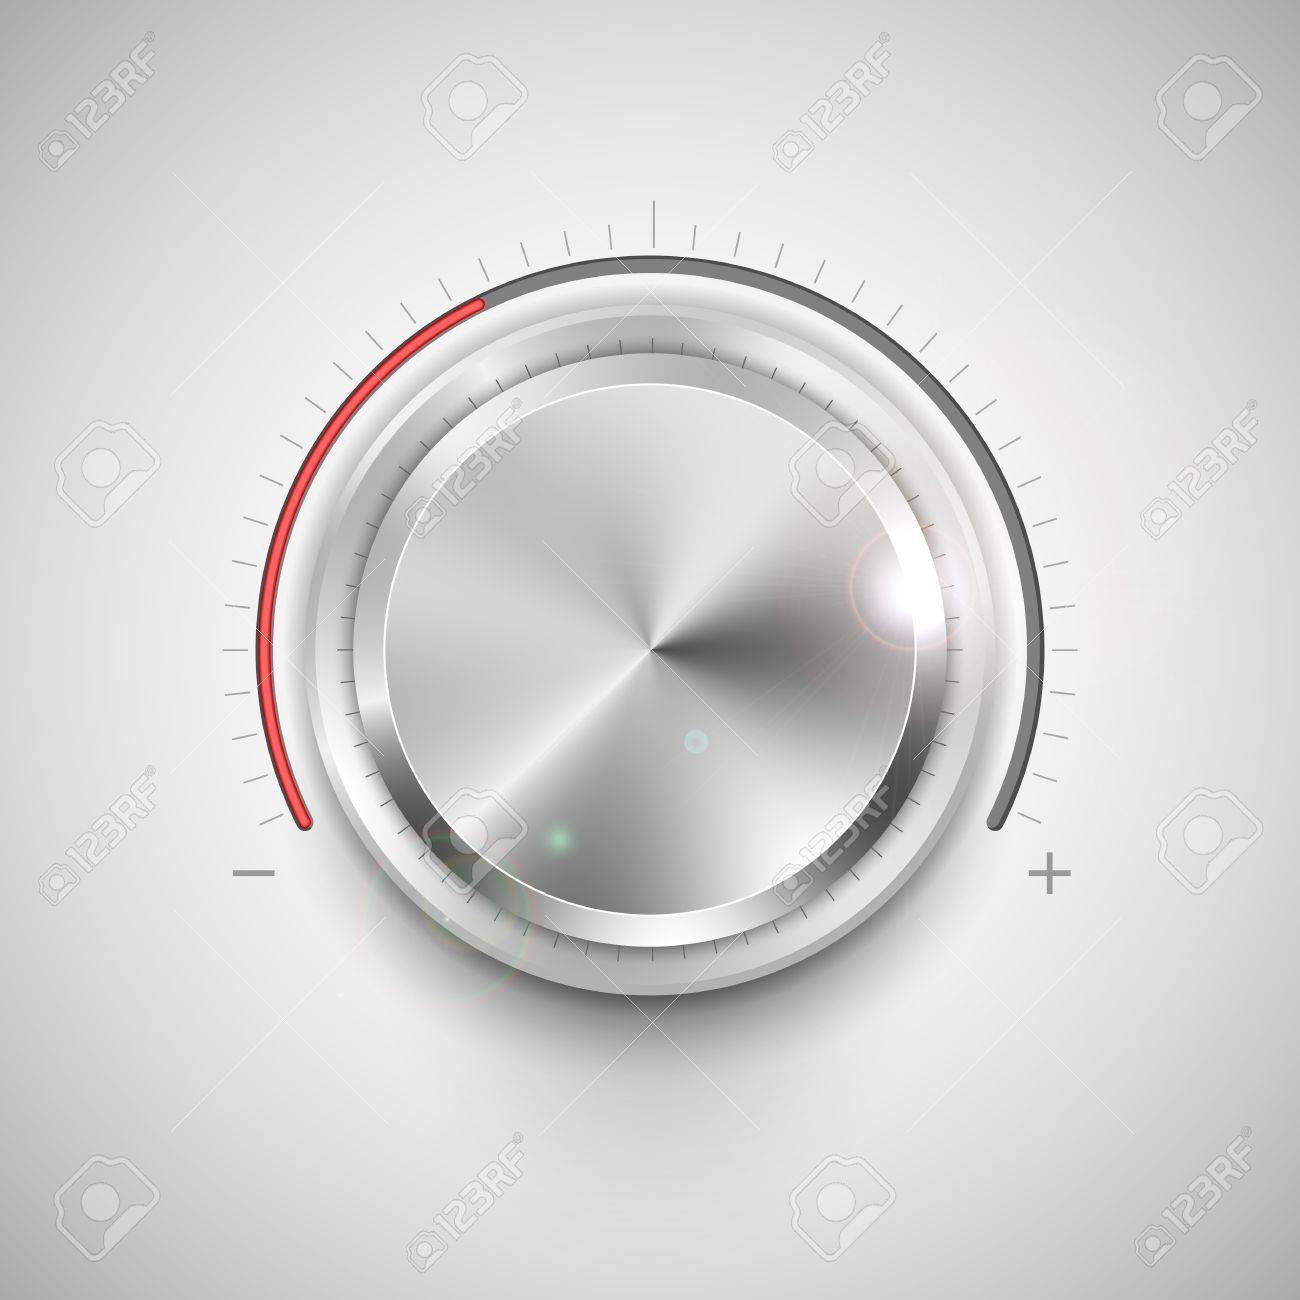 illustration of chrome knob for adjustment Stock Vector - 20335367